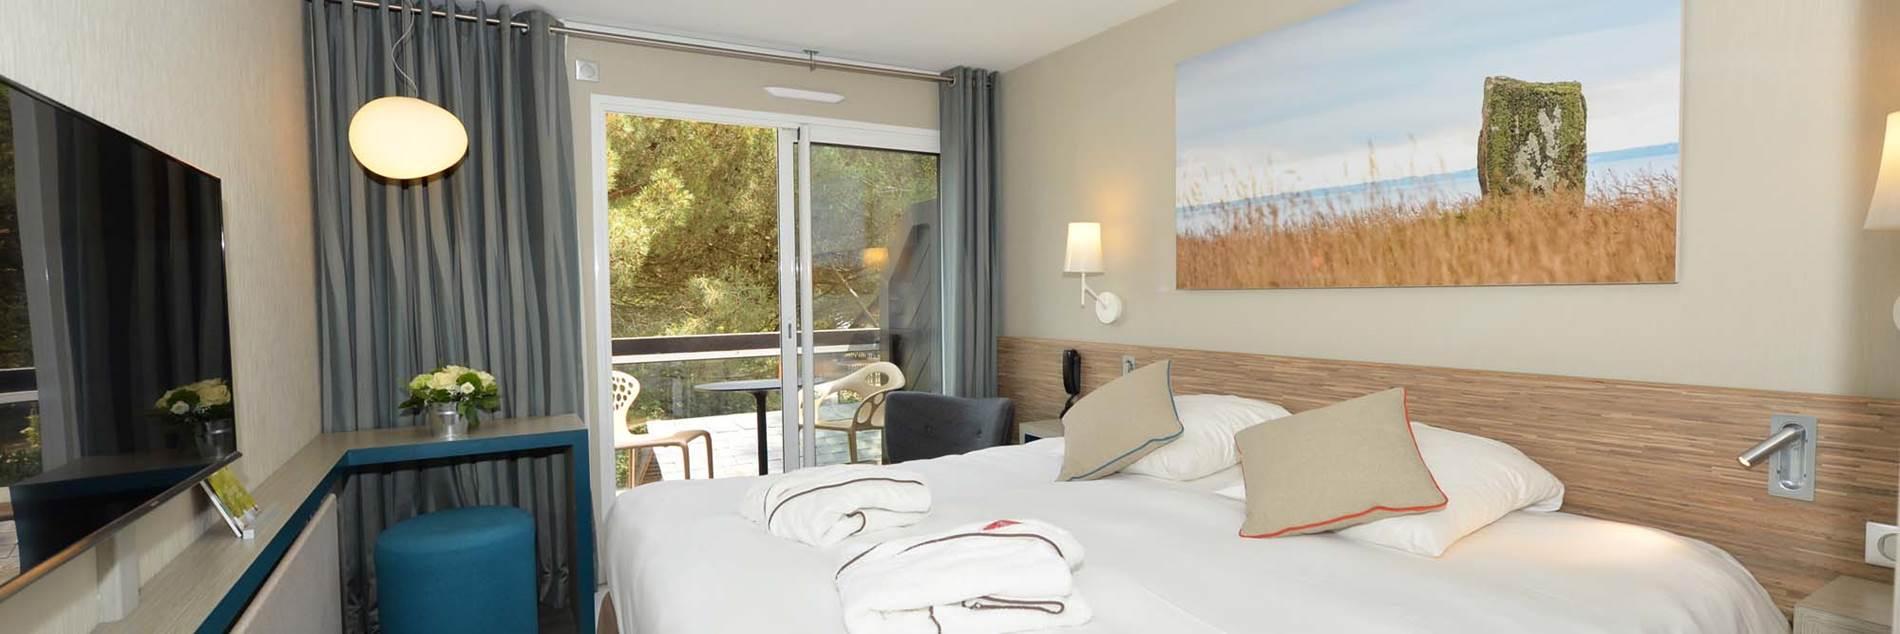 Thalazur-Carnac-Hotel-Les-Salines-Morbihan-Bretagne-Sud © Michel RENAC